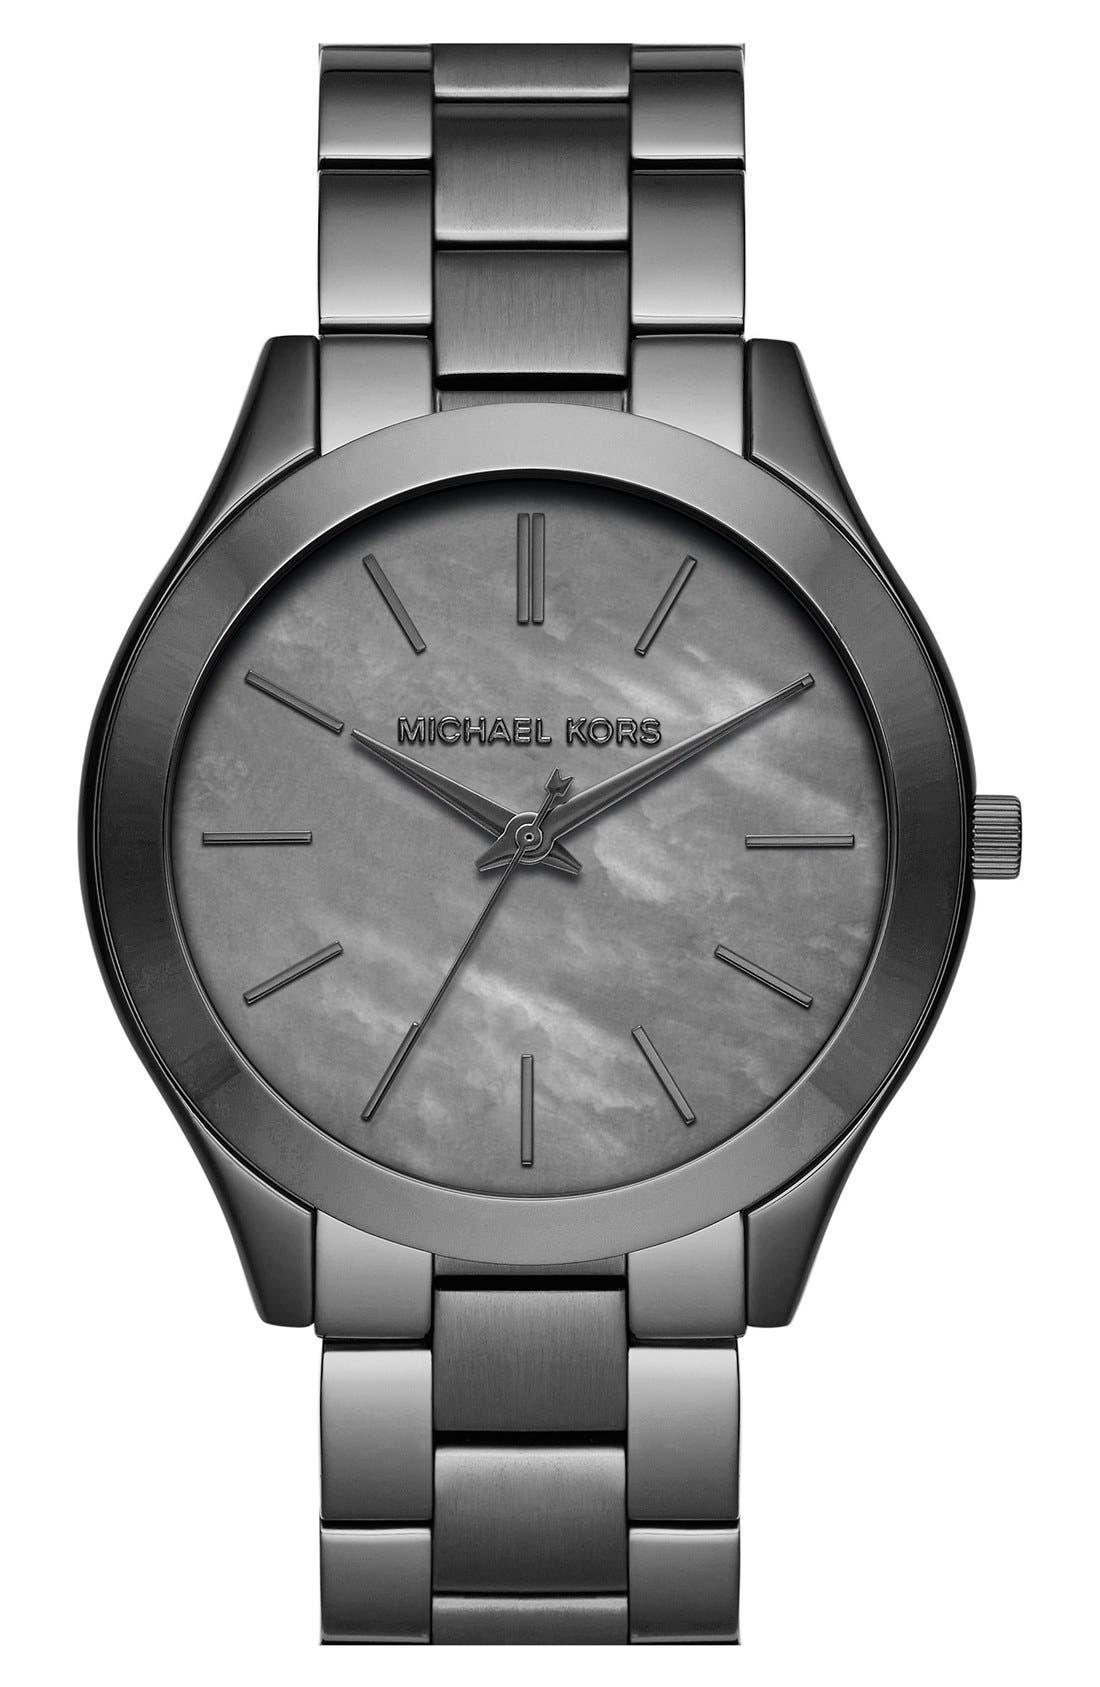 Main Image - Michael Kors 'Slim Runway' Mop Dial Bracelet Watch, 42mm